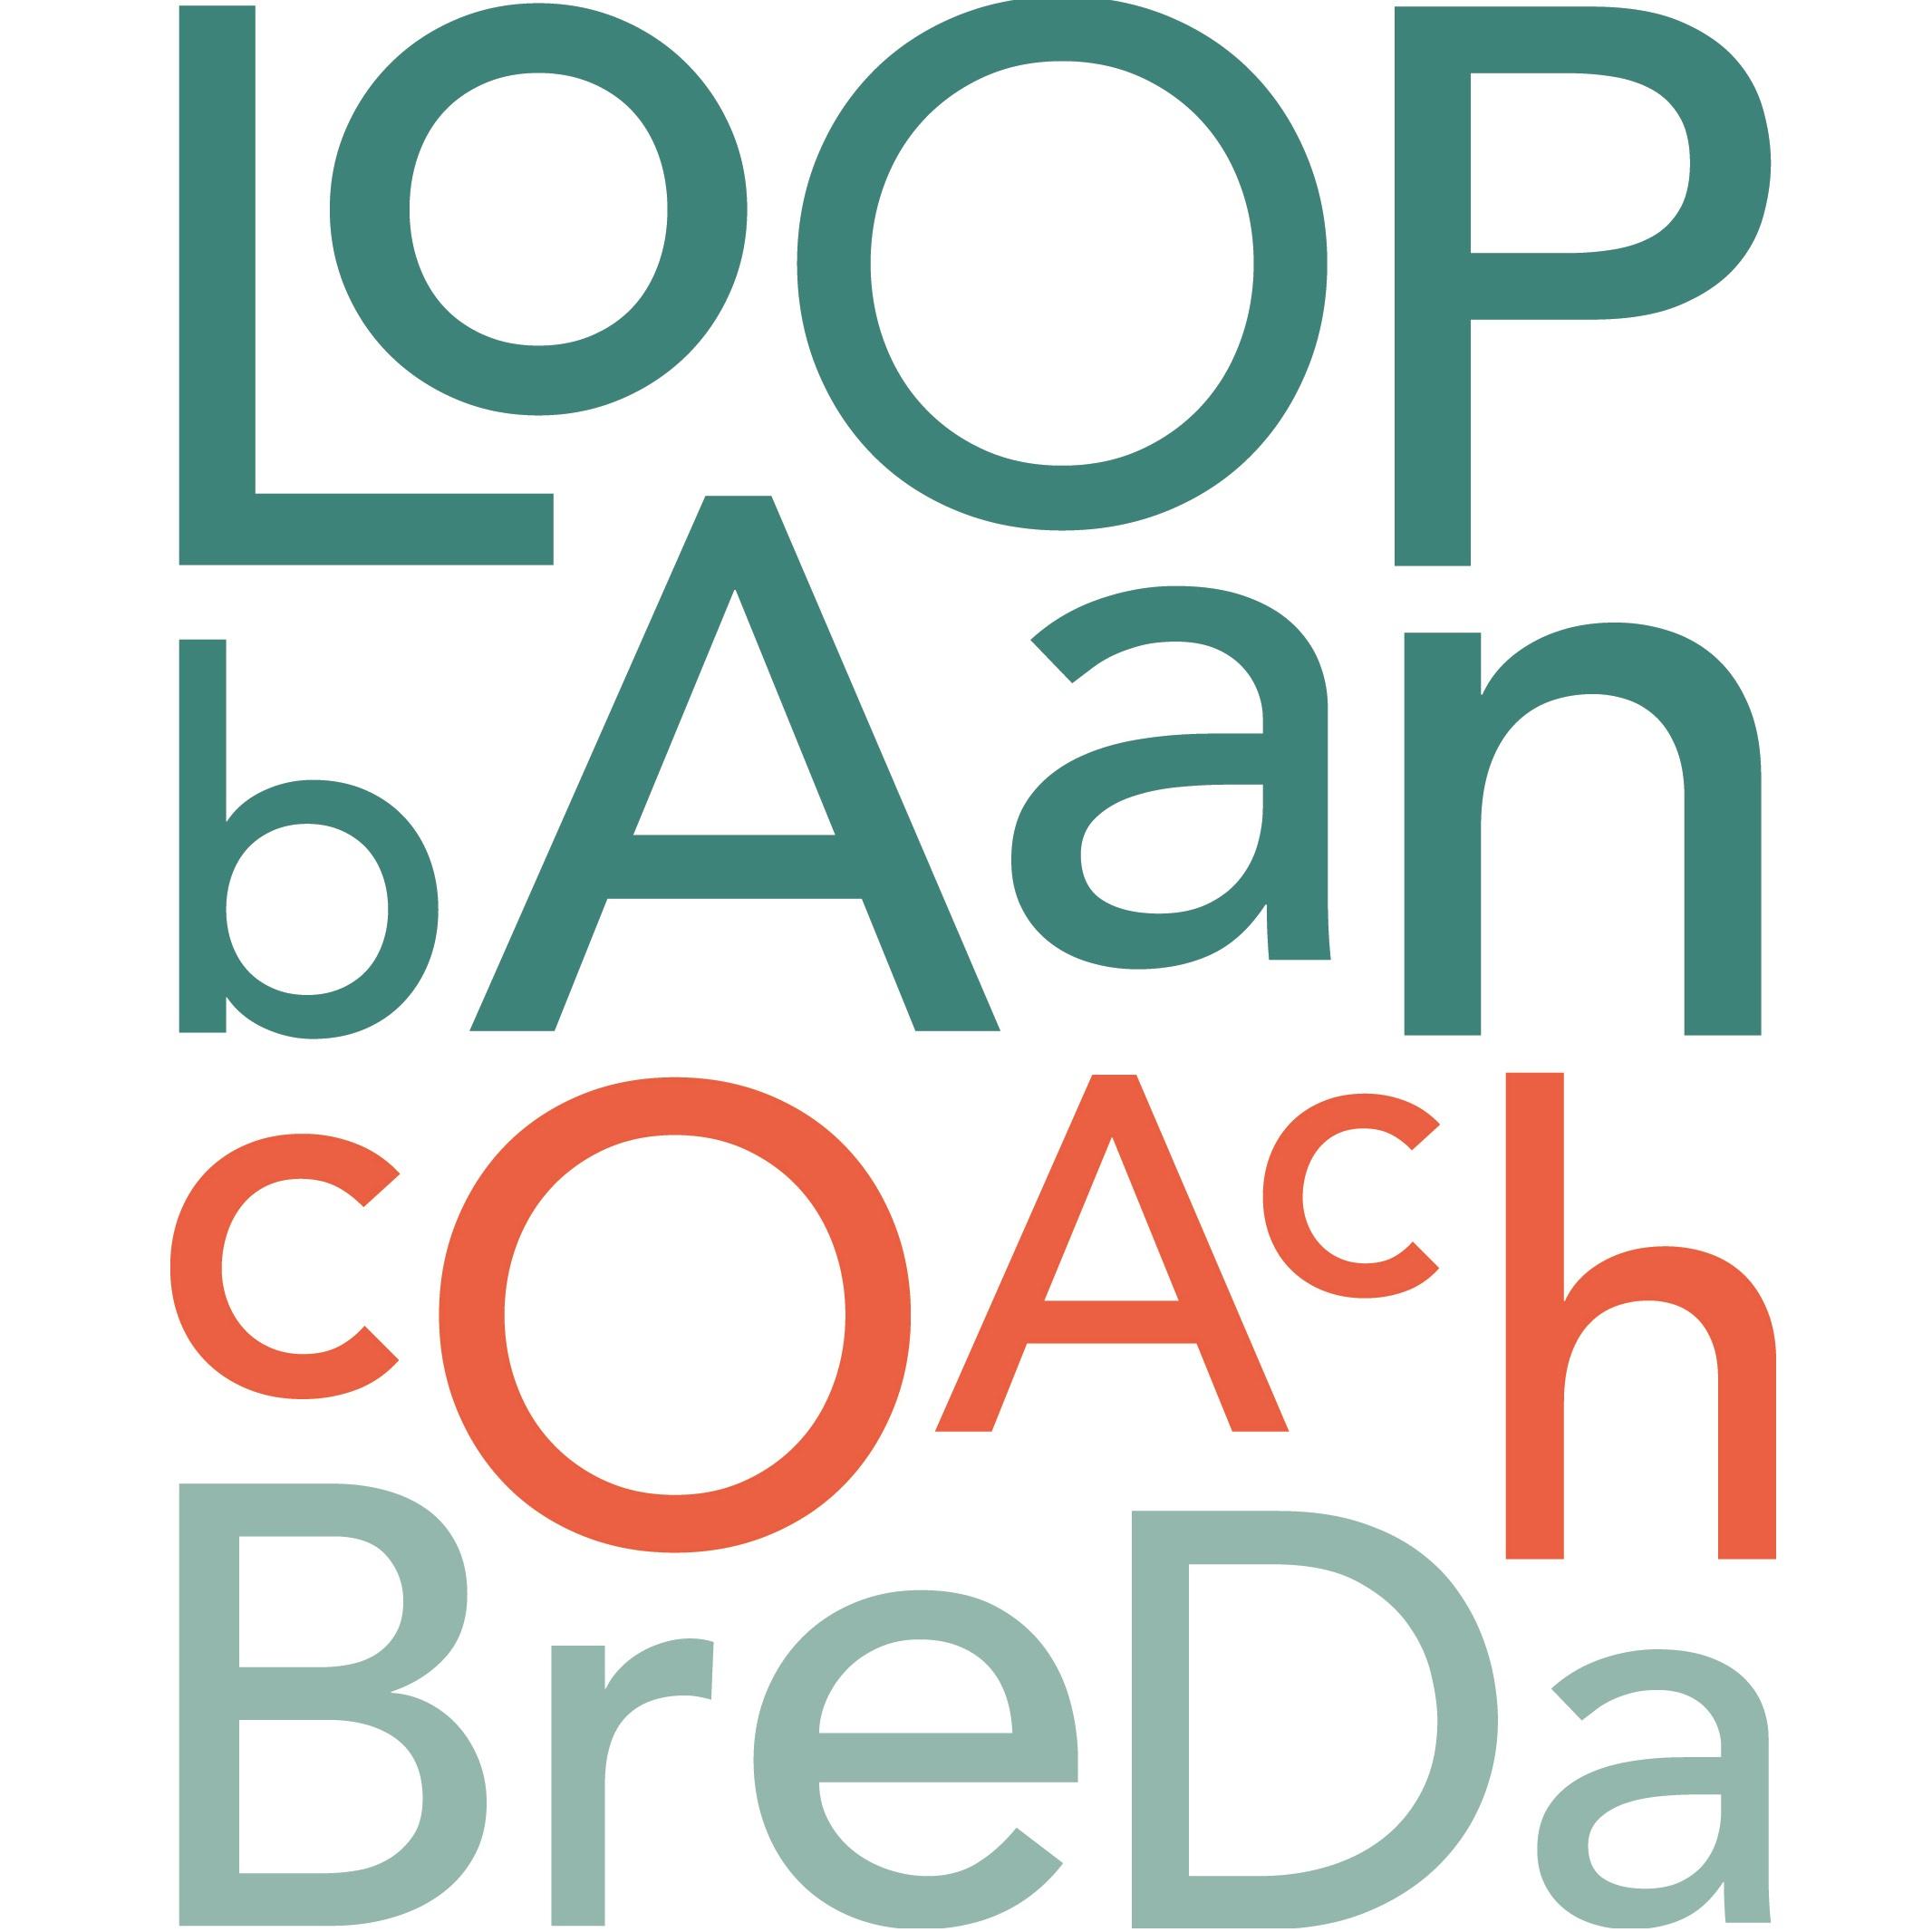 Dé loopbaancoach van Breda en omstreken